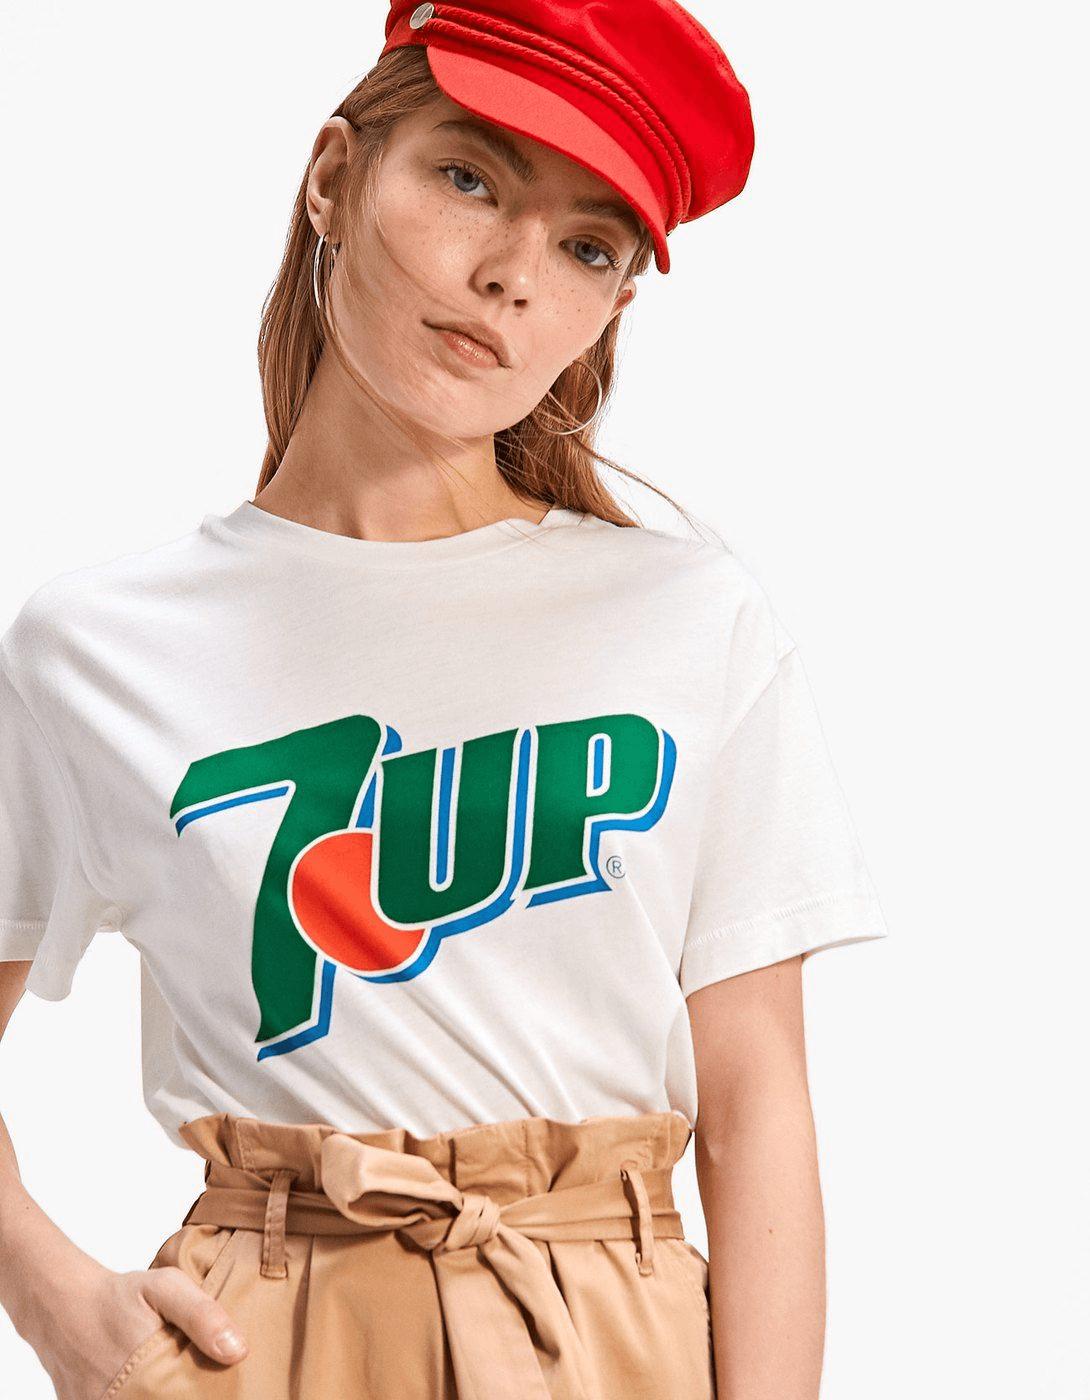 camisetas molonas, stradivarius, 7up